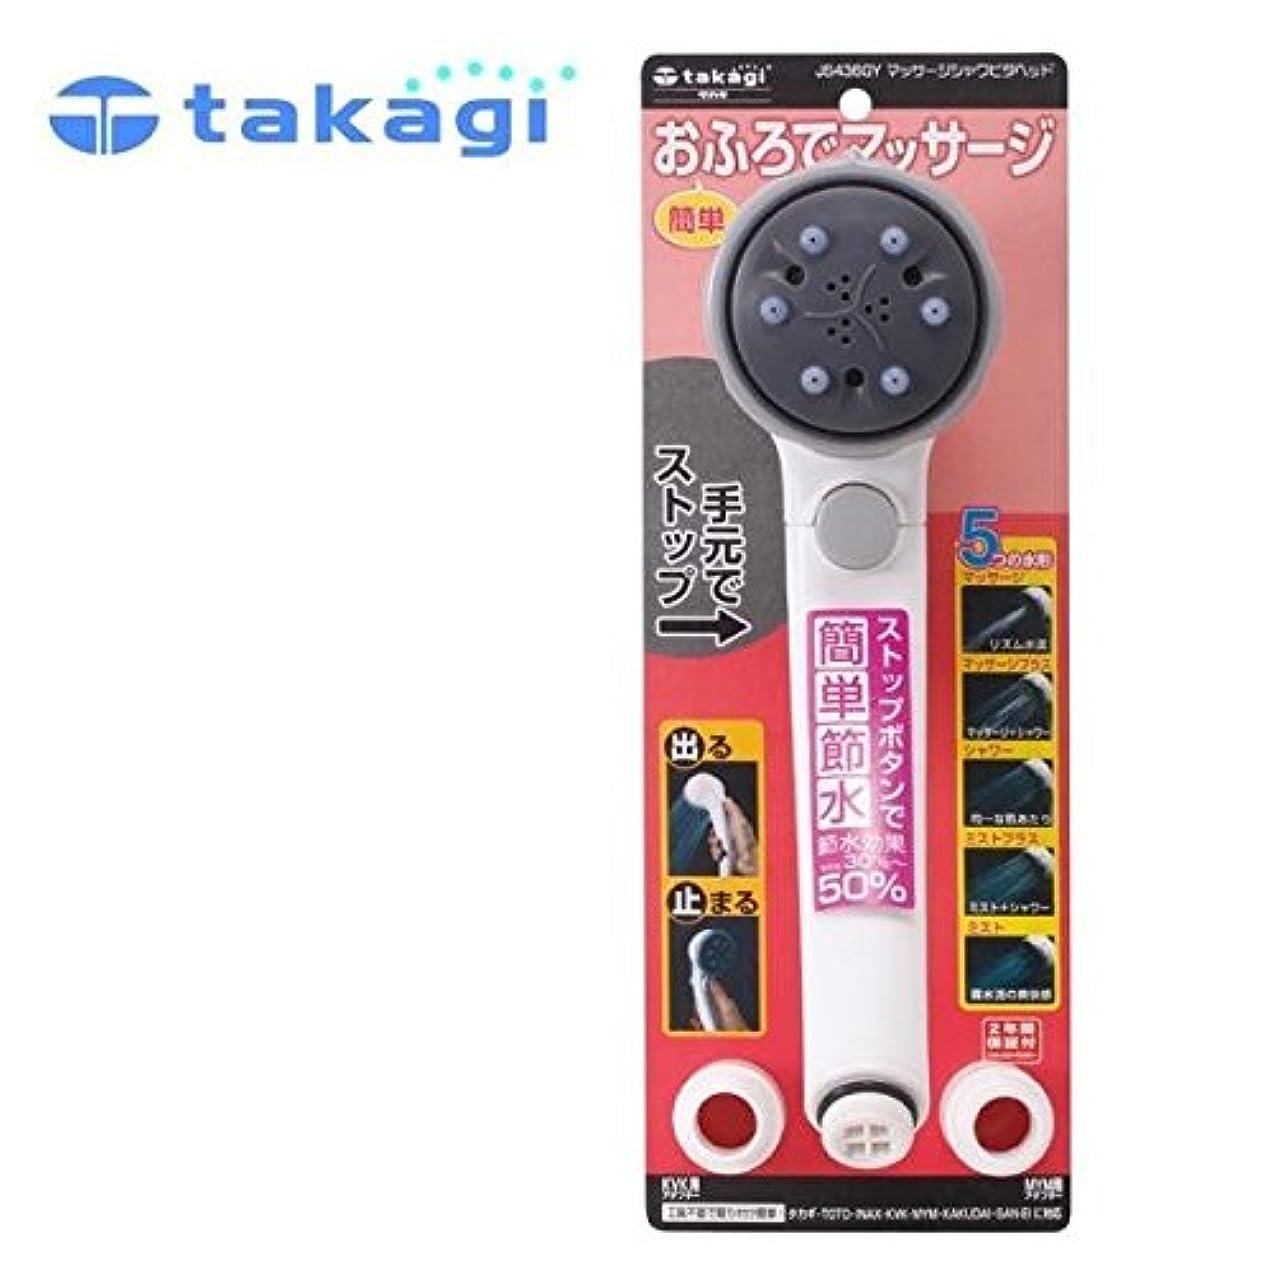 takagi タカギ 浴室用シャワーヘッド マッサージシャワピタヘッド【同梱?代引不可】